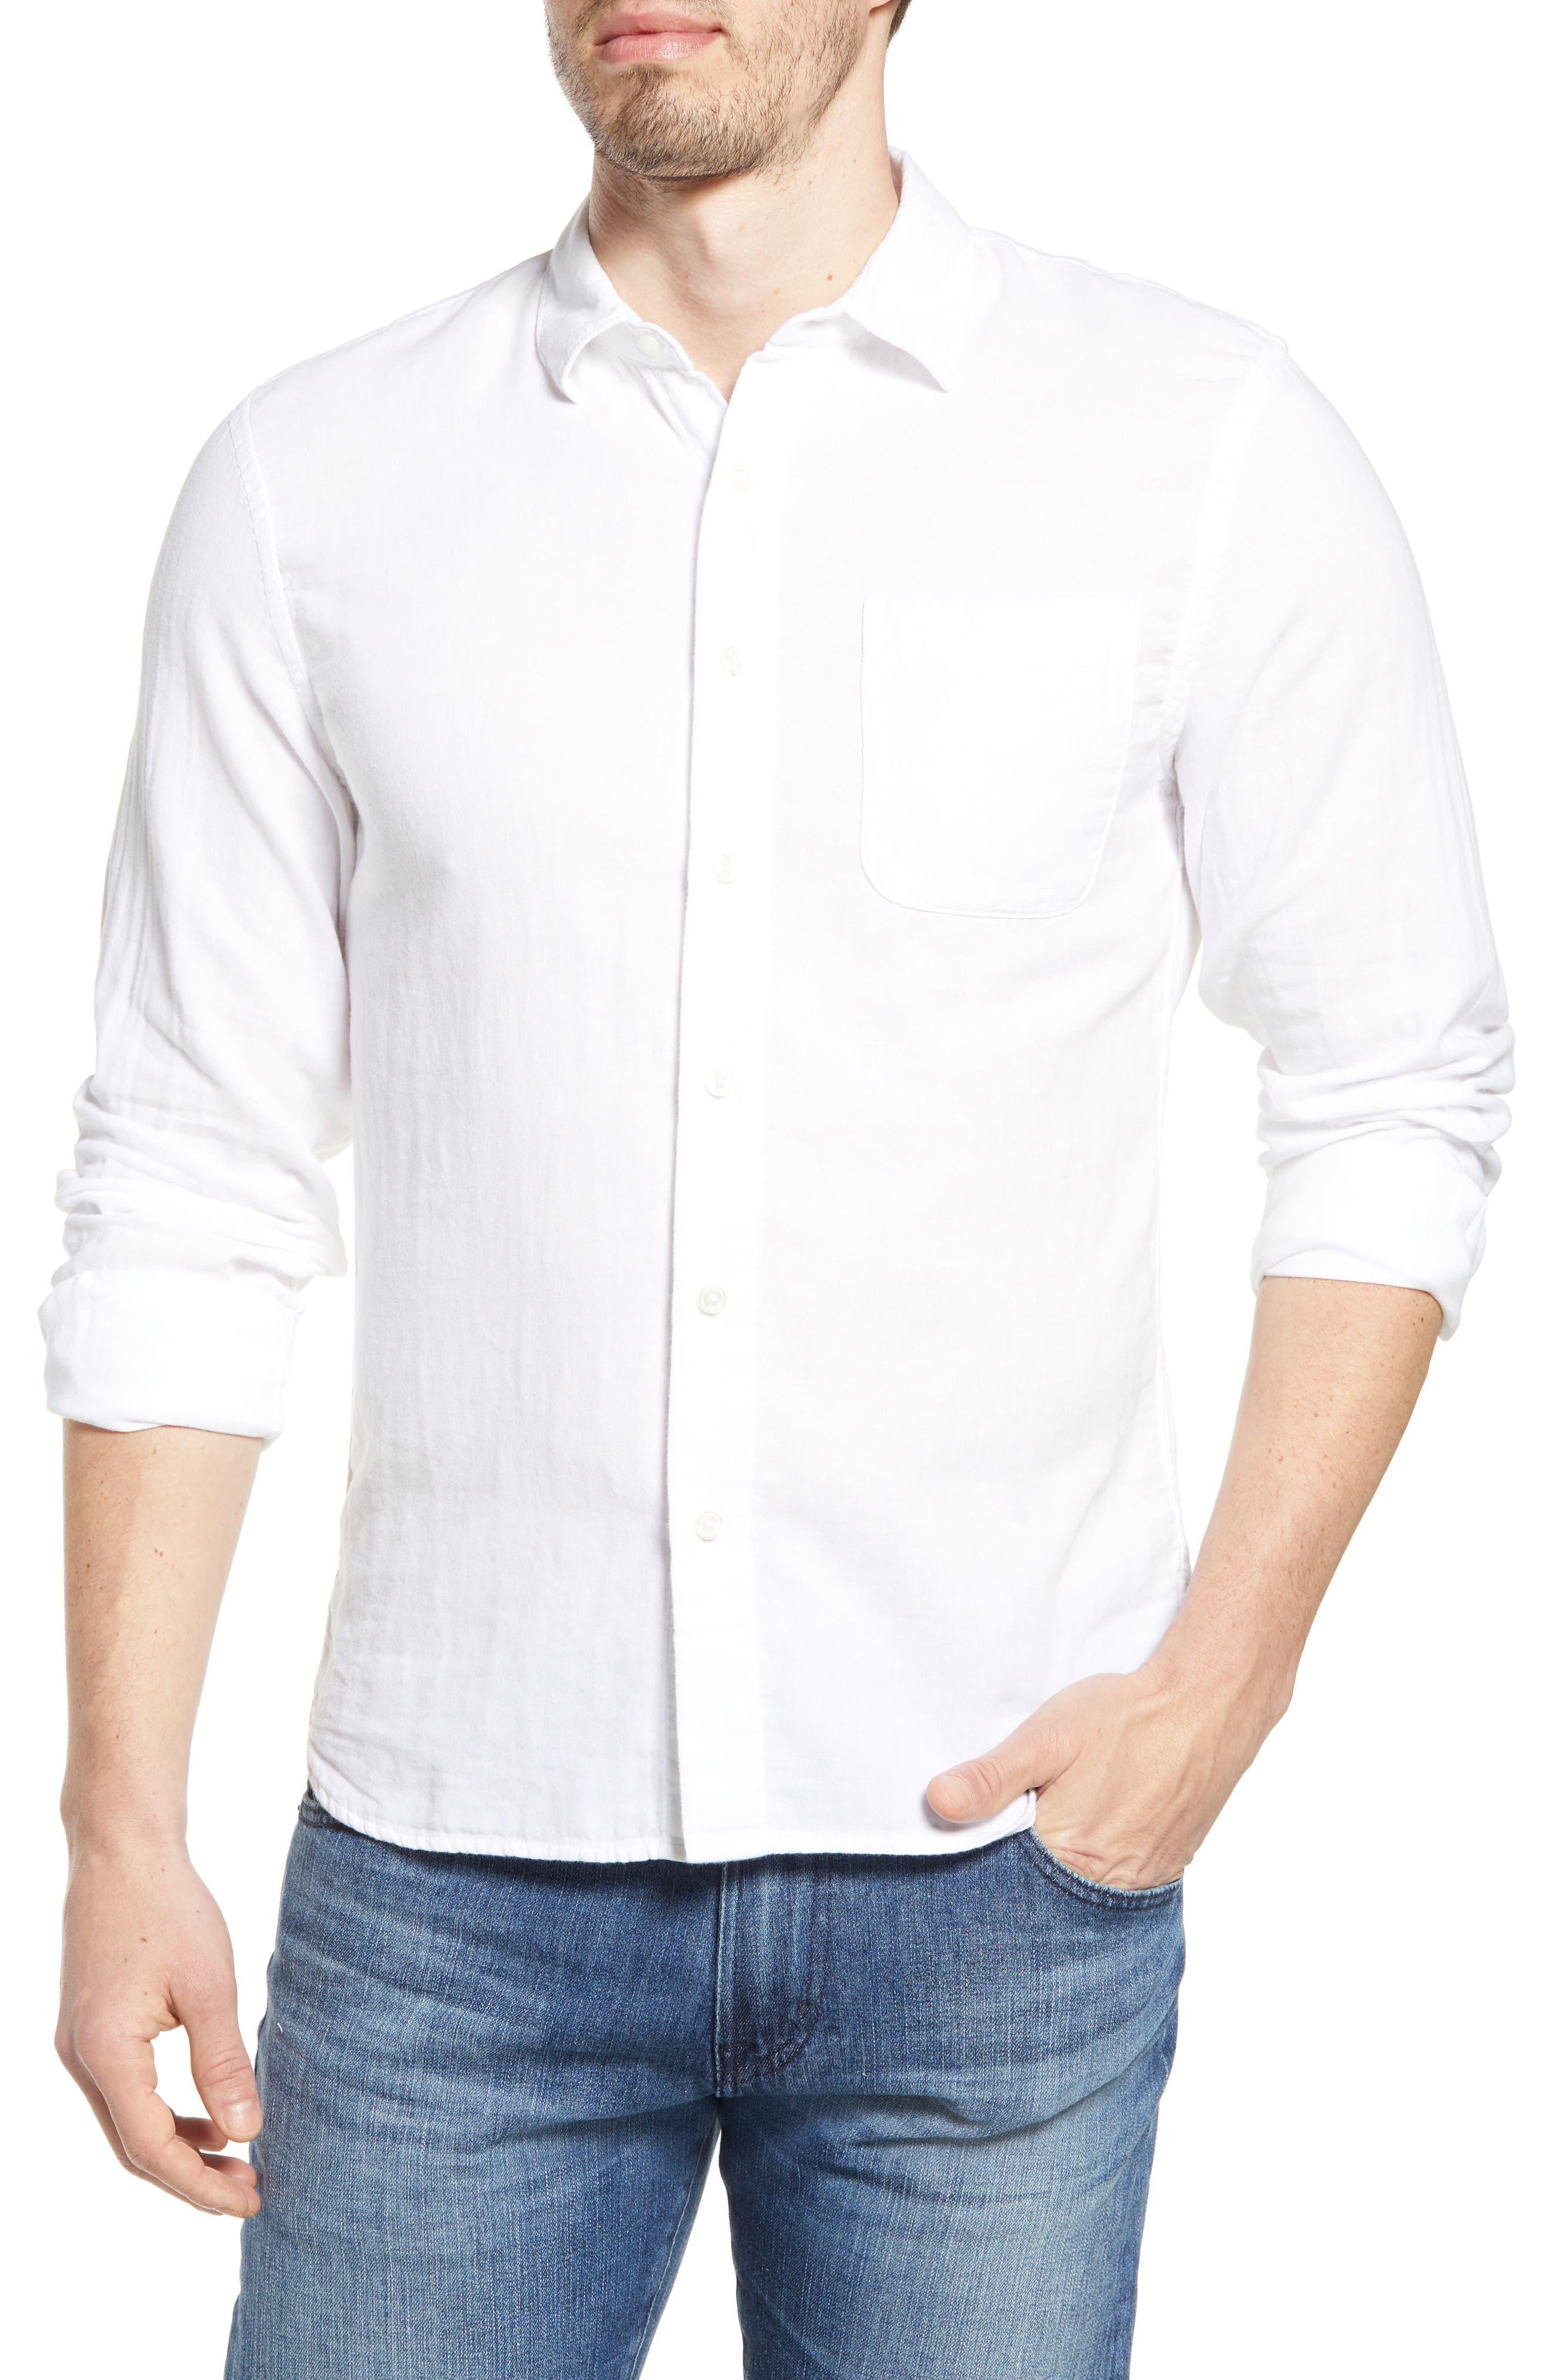 The Ripper Organic Cotton Gauze Button-Up Shirt